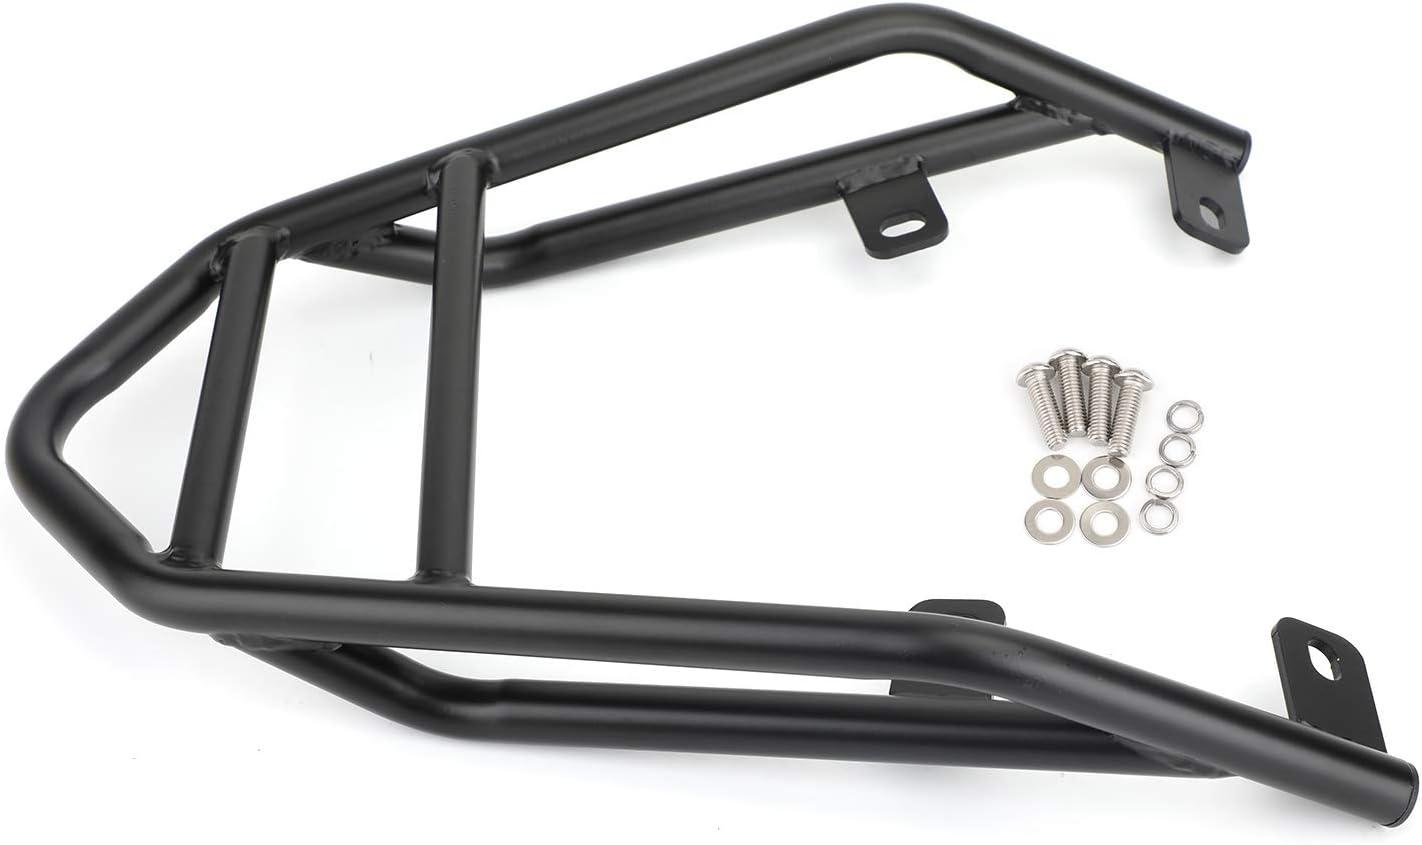 Areyourshop Black Rear Carrier Luggage Rack Fit for Ducati Scrambler 400 803 1100 2016-2019